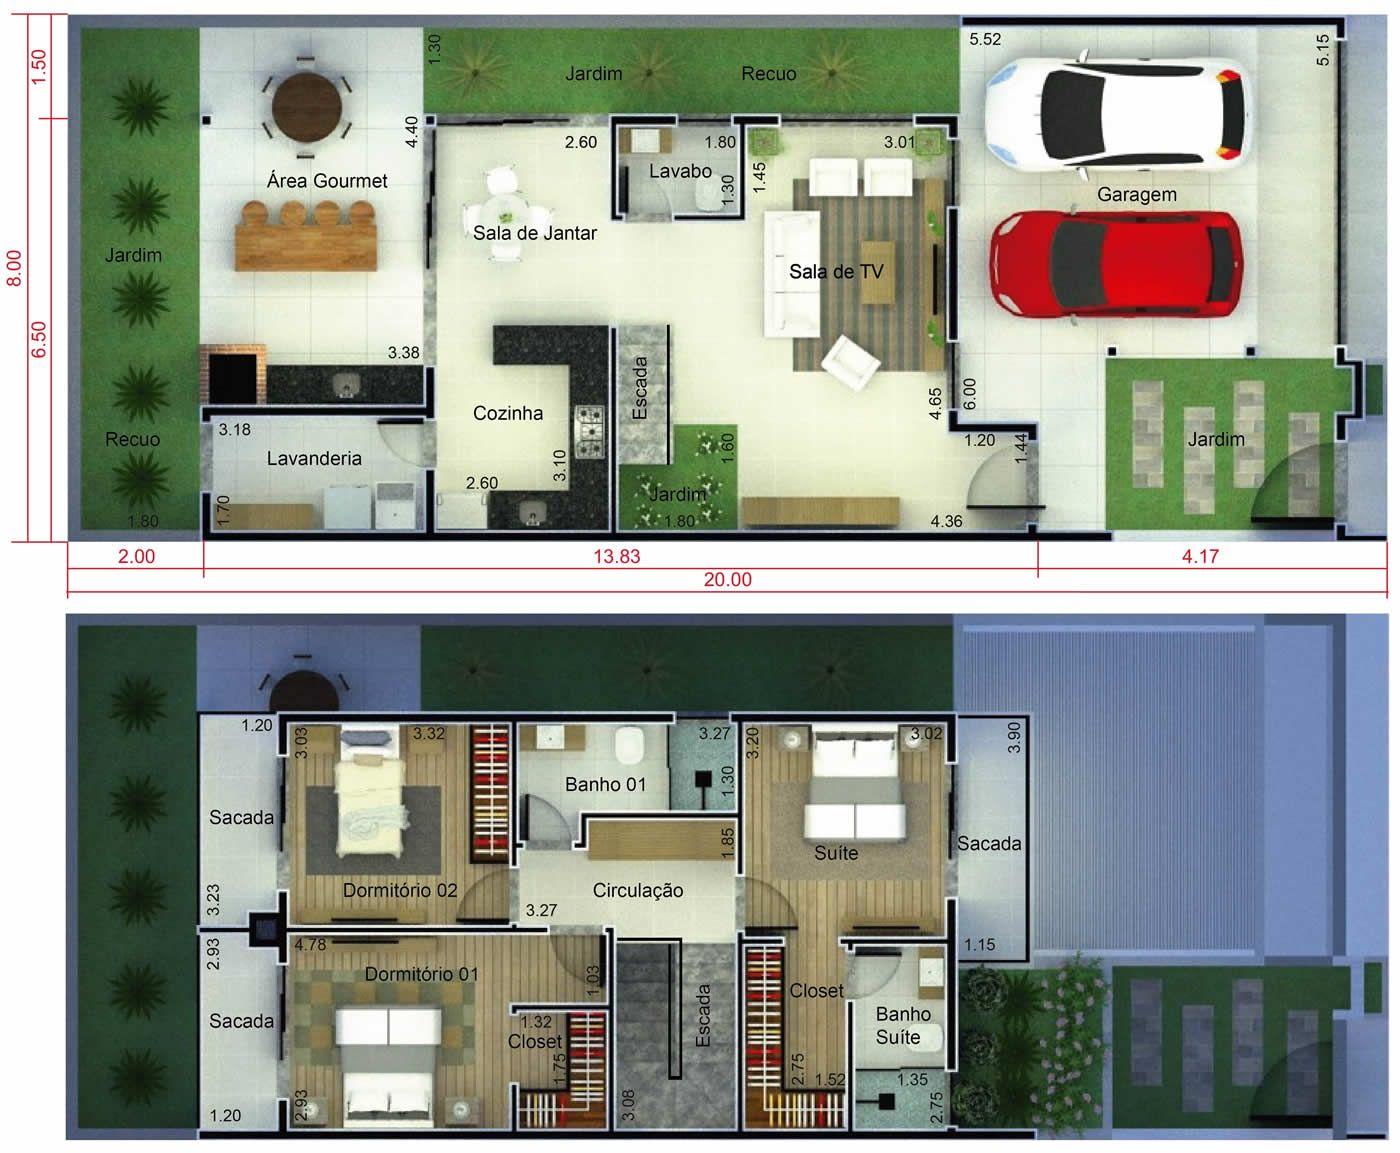 Plano De Casa De 3 Habitaciones Con Balcon Plano Para Terreno 8x20 Planos De Casas Casas Disenos De Casas